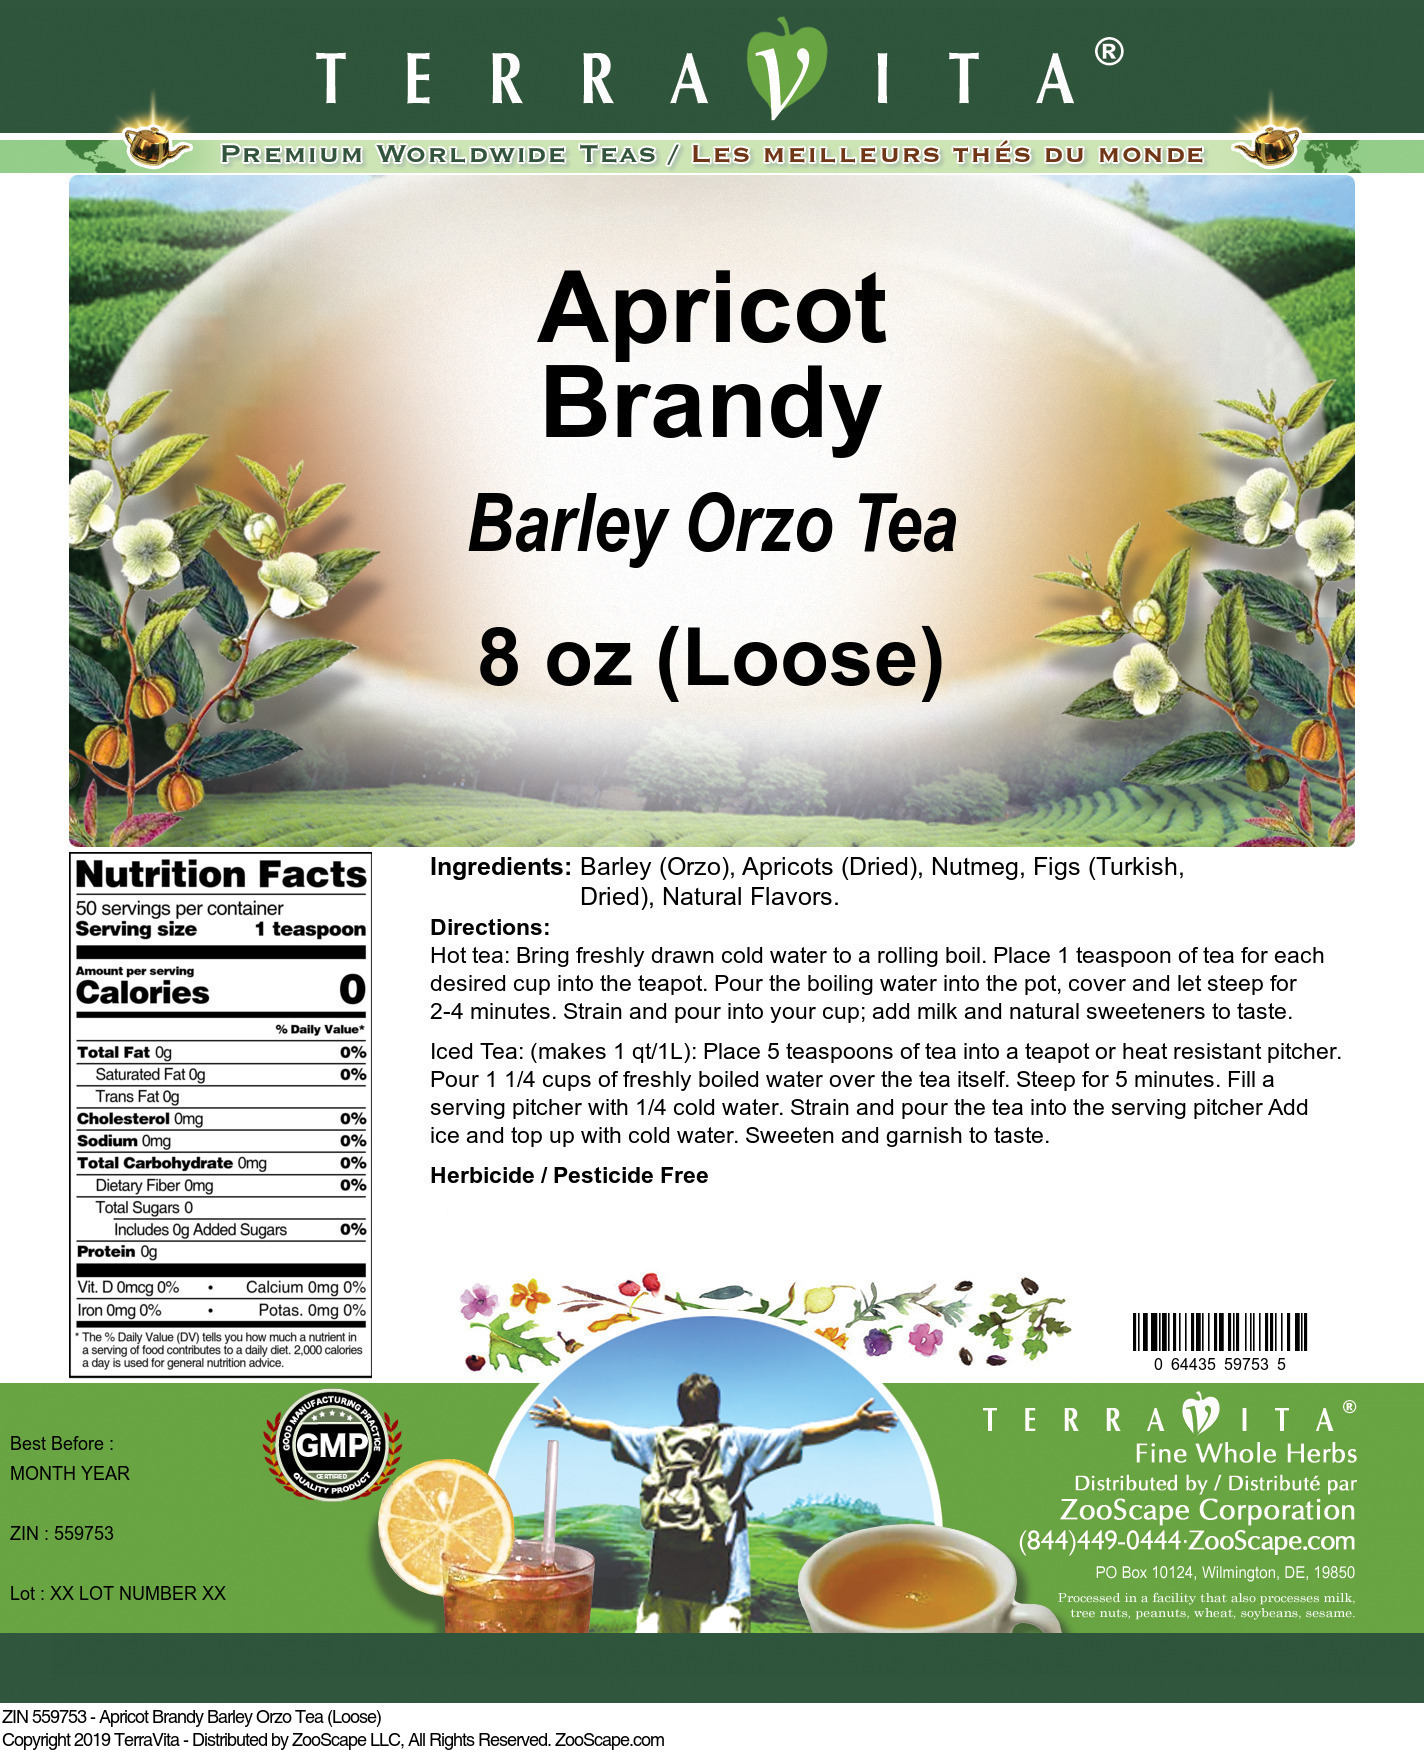 Apricot Brandy Barley Orzo Tea (Loose)